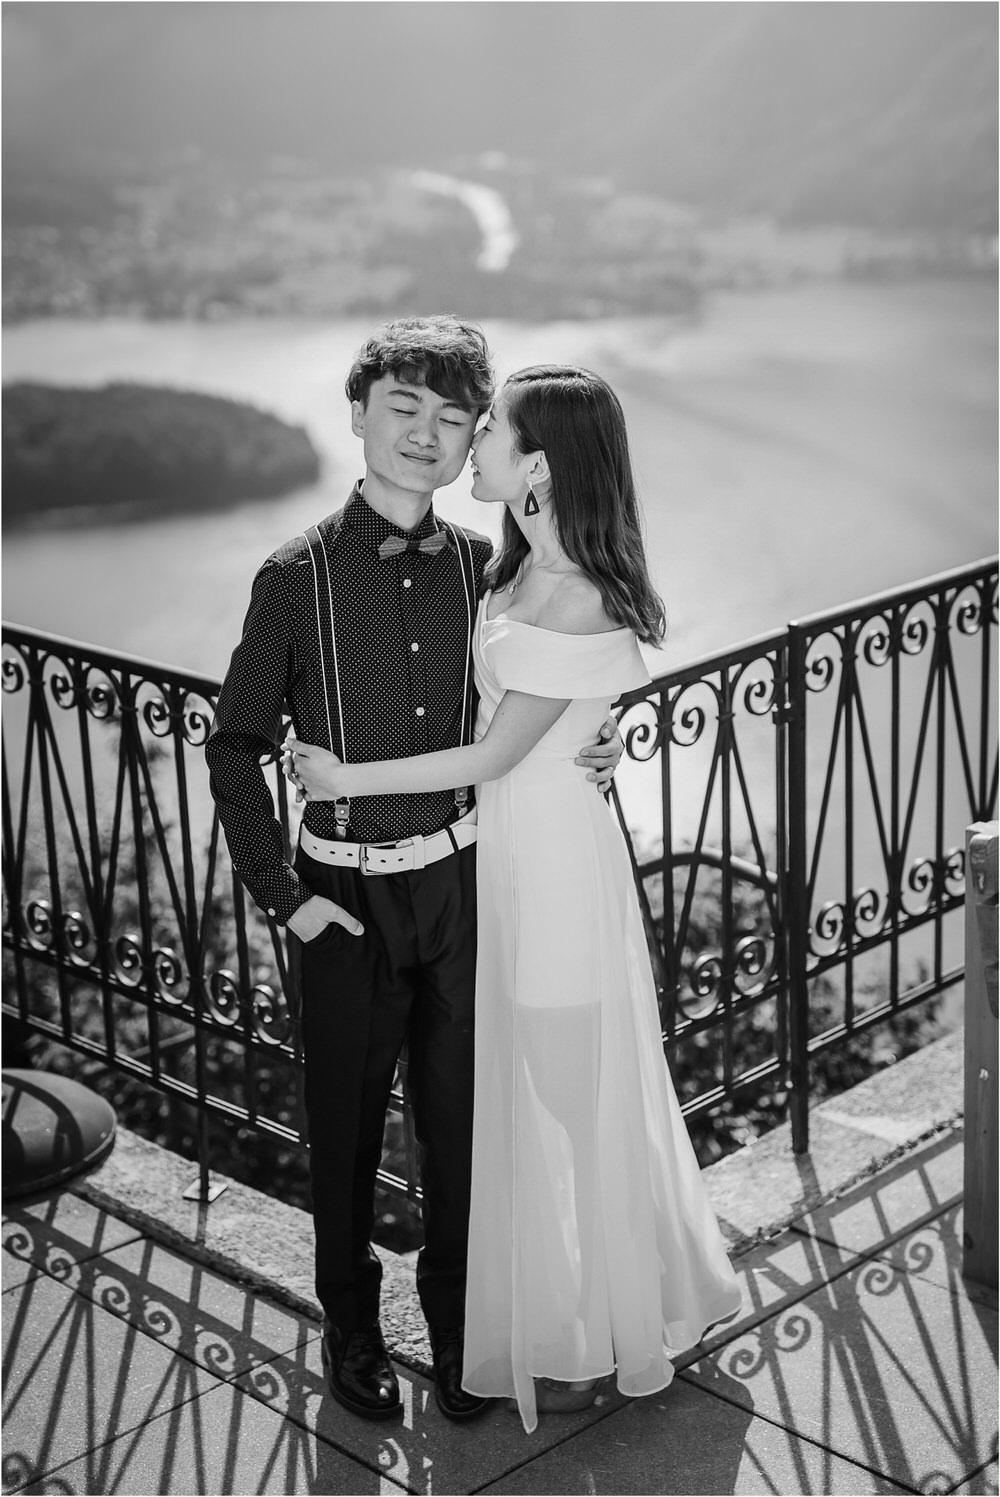 hallstatt austria wedding engagement photographer asian proposal surprise photography recommended nature professional 0068.jpg